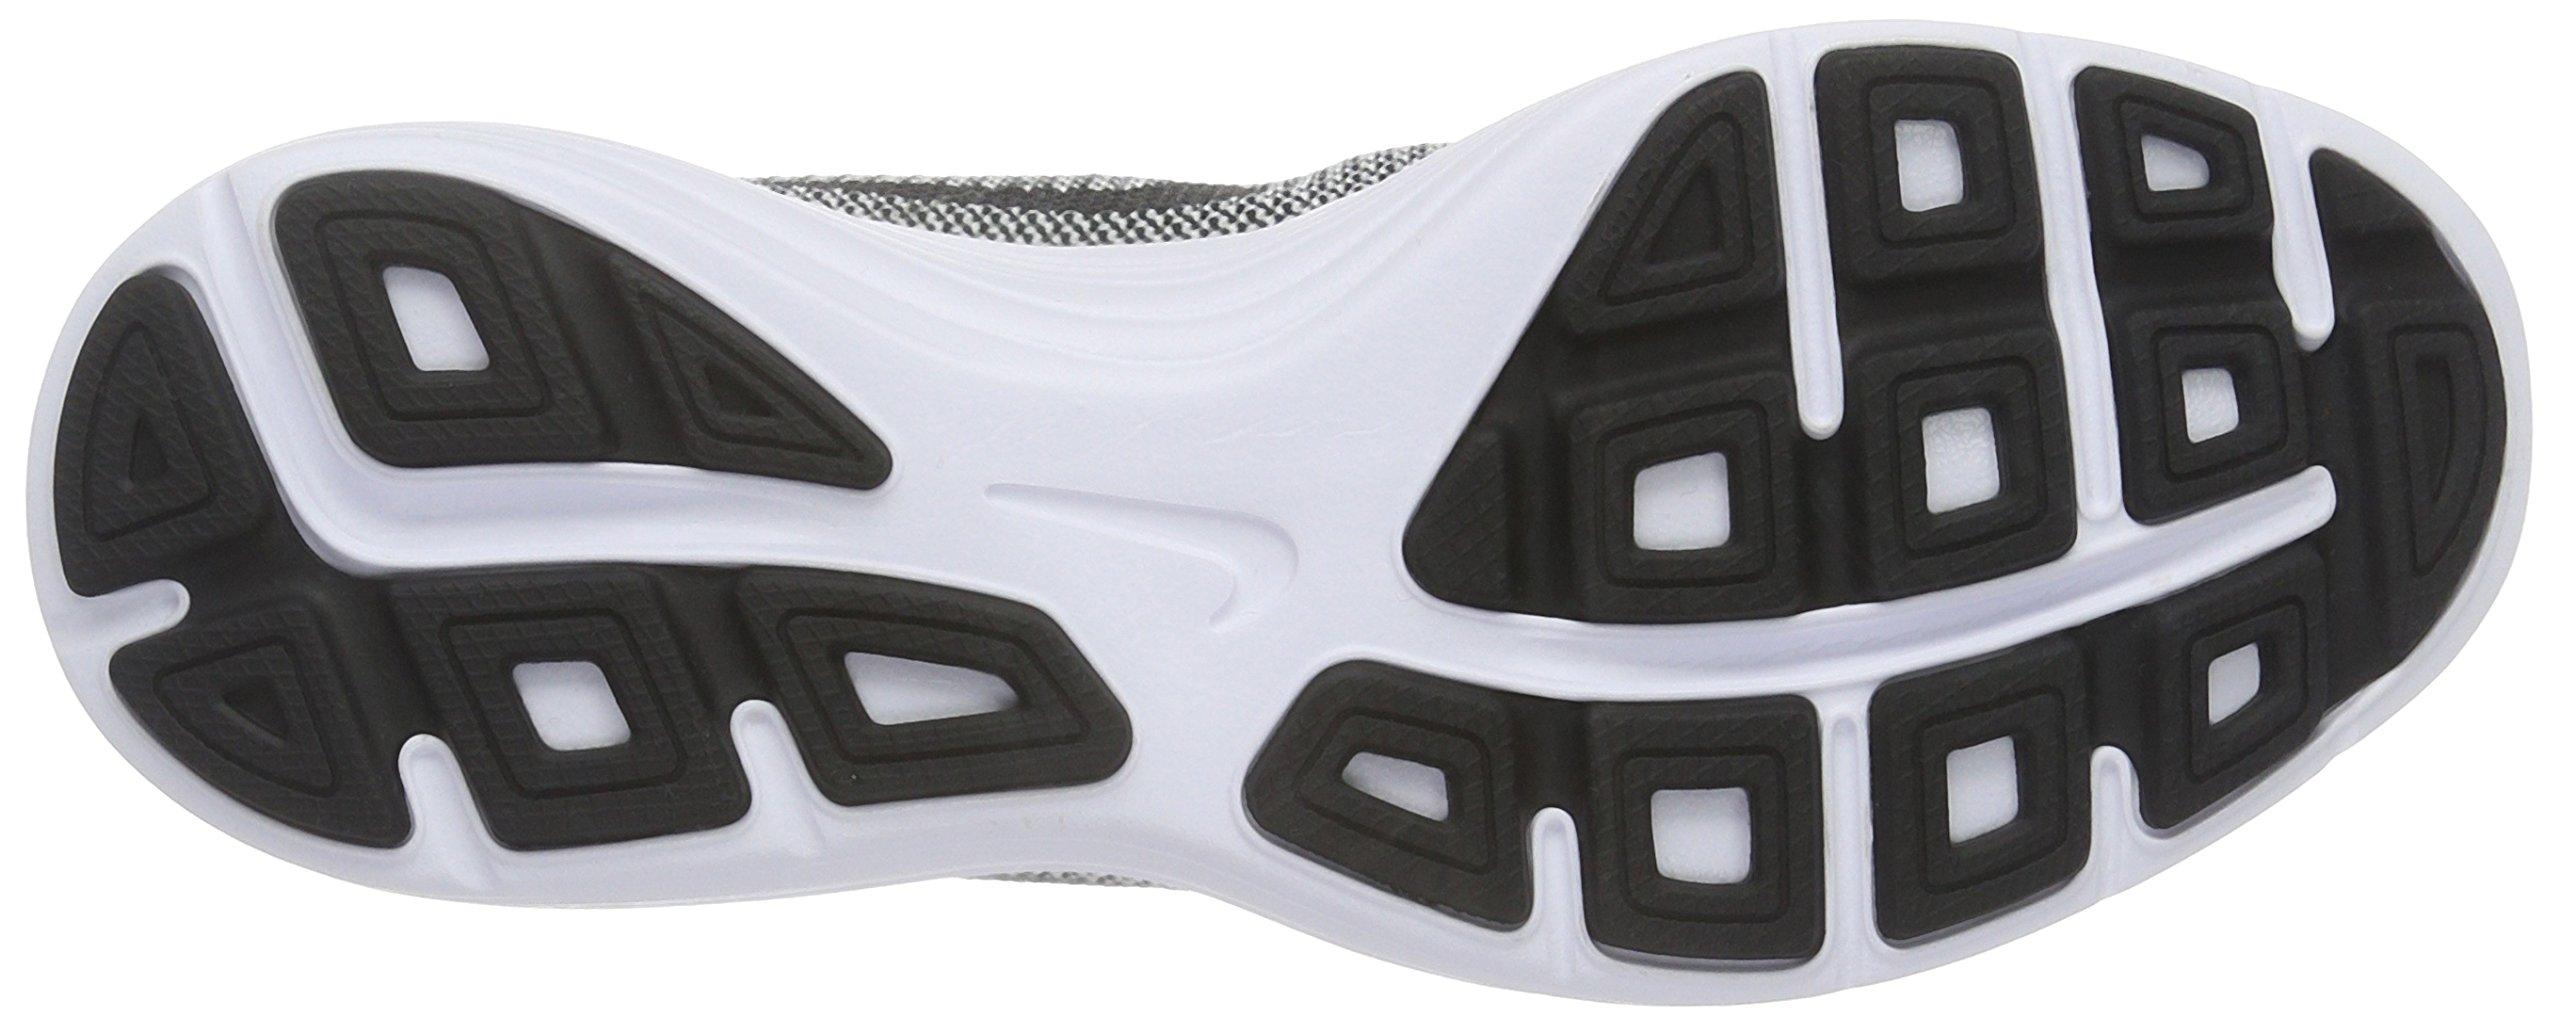 Nike Boys' Revolution 3 (GS) Running Shoe Black/White/Volt, 4.5 M US Big Kid by Nike (Image #3)